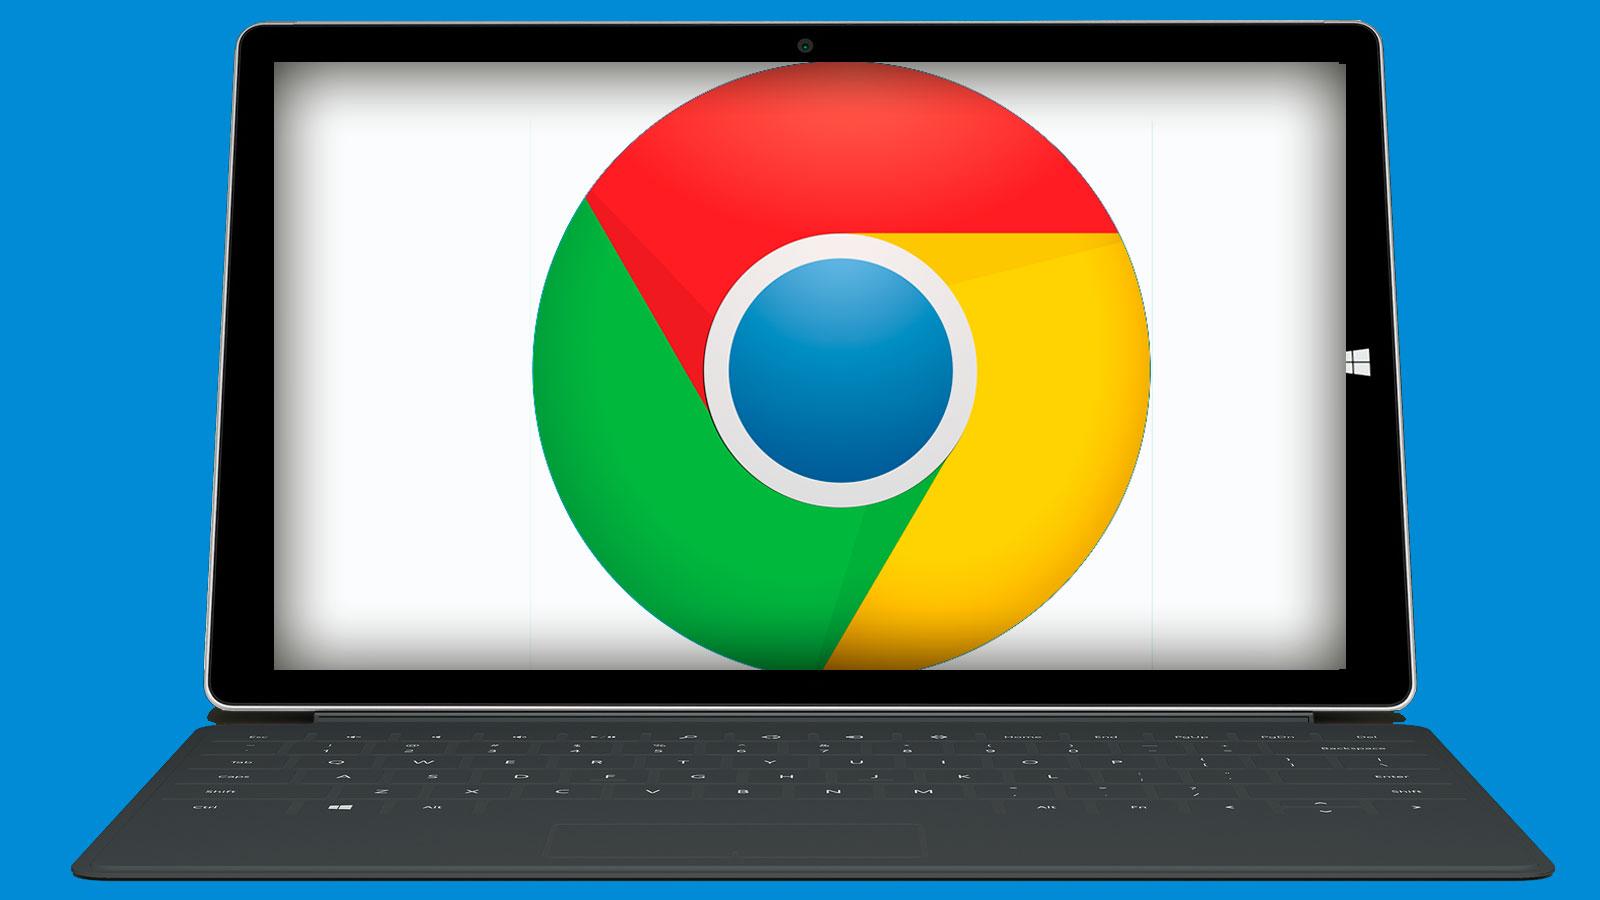 <b>Google</b> <b>Chrome</b> - <b>Télécharger</b> Gratuitement